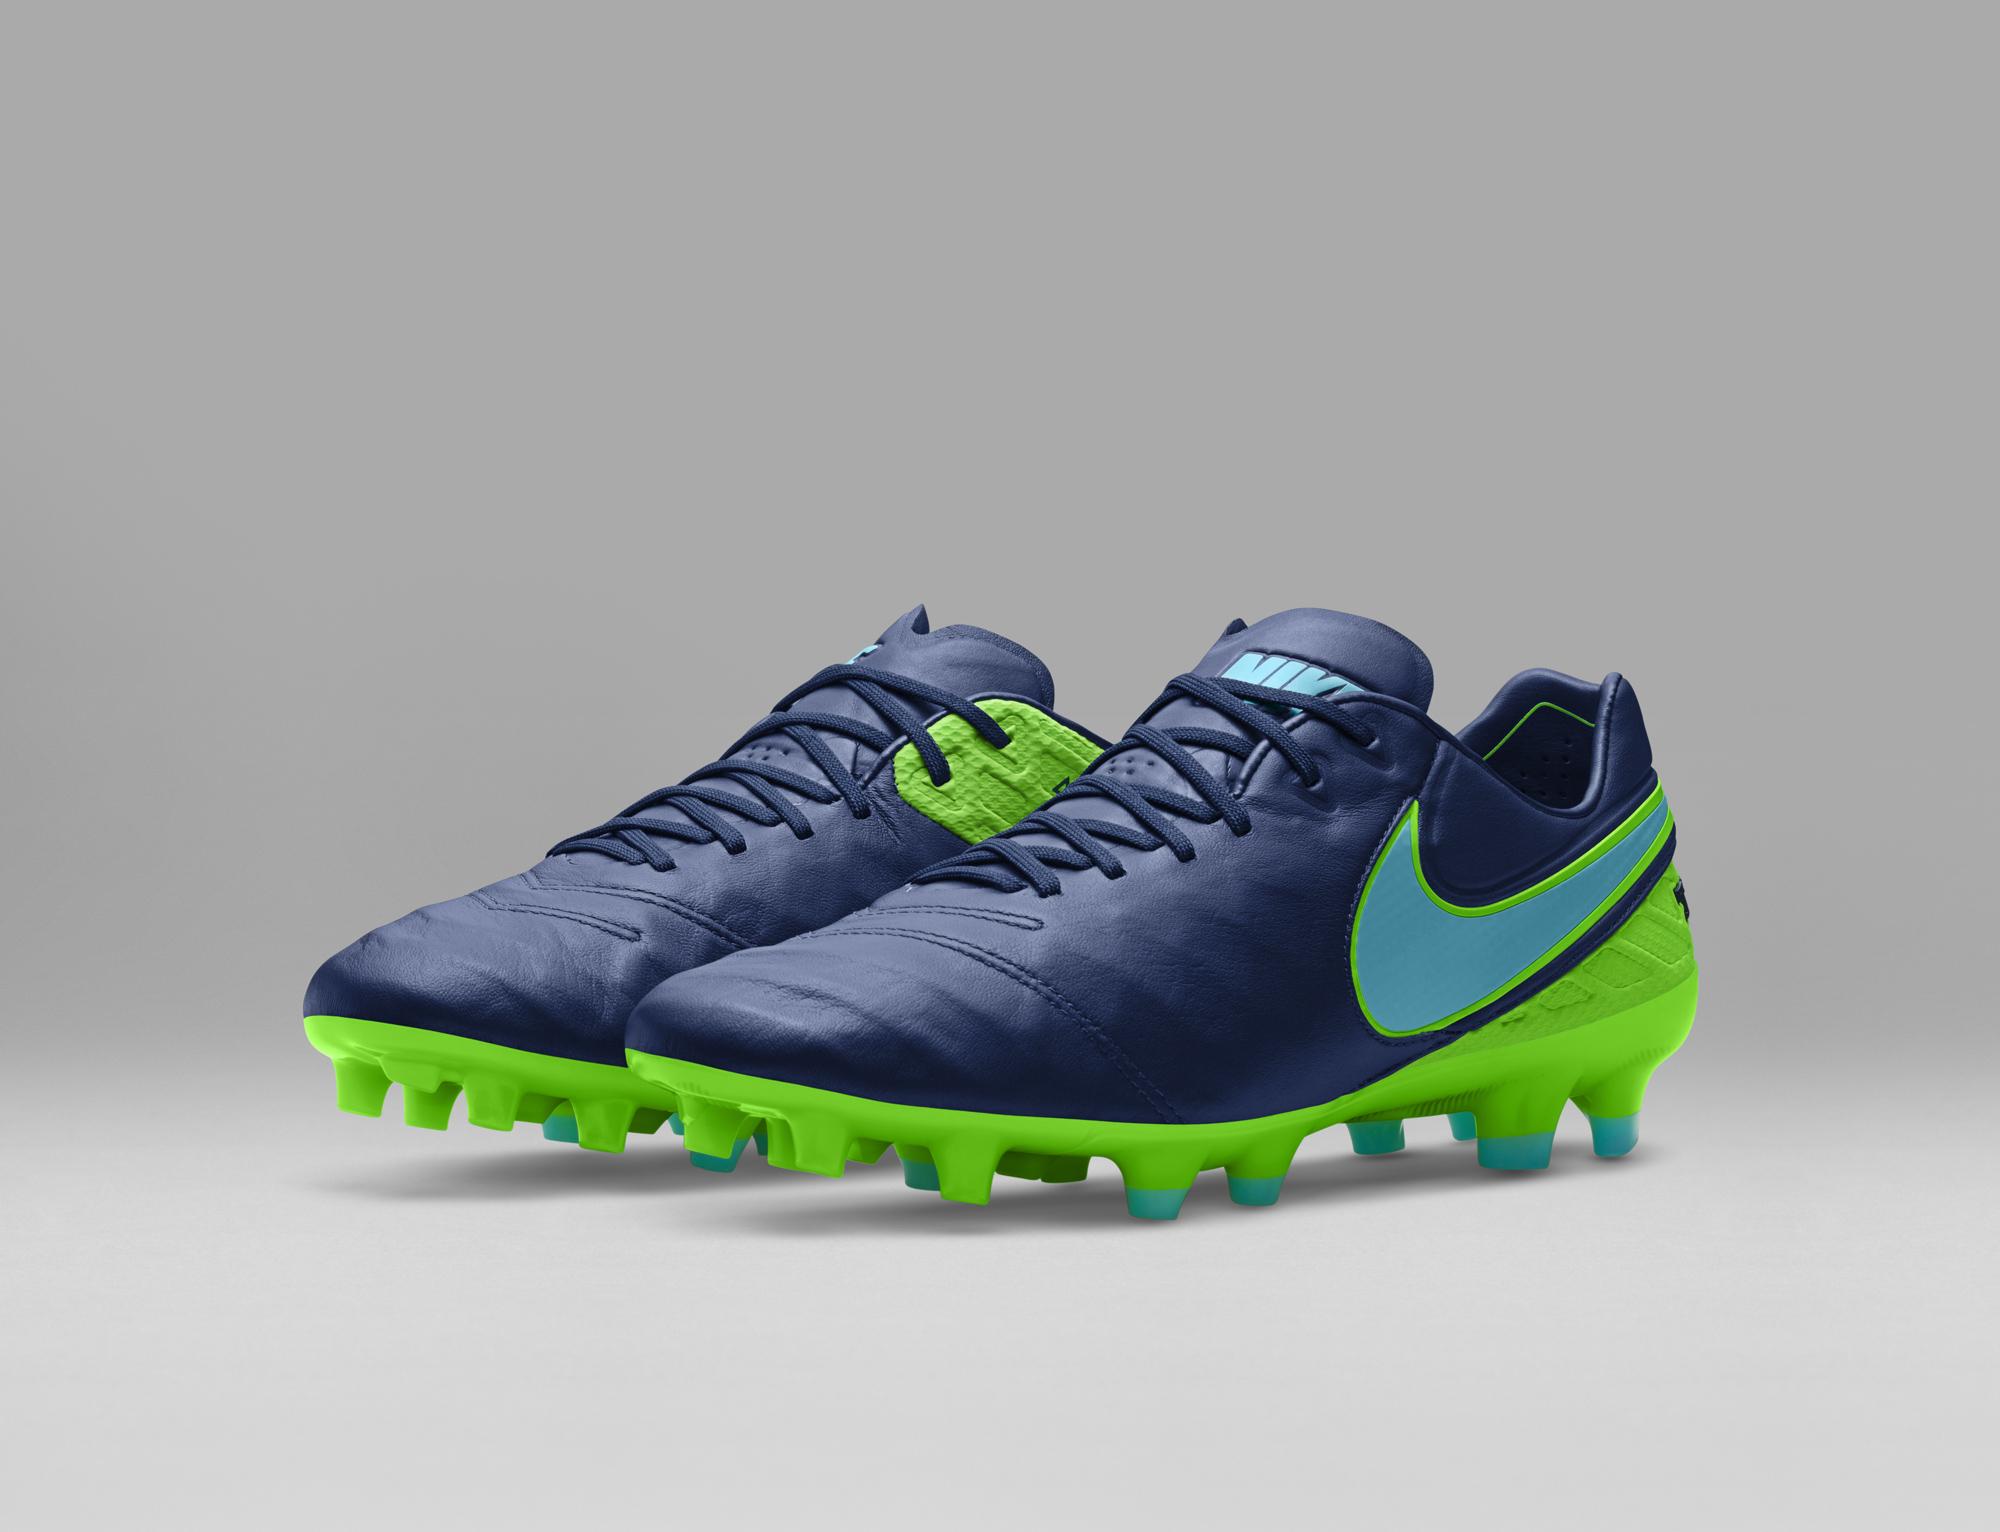 wholesale dealer 91896 0a94a Nike Football Floodlights Pack - SoccerNation